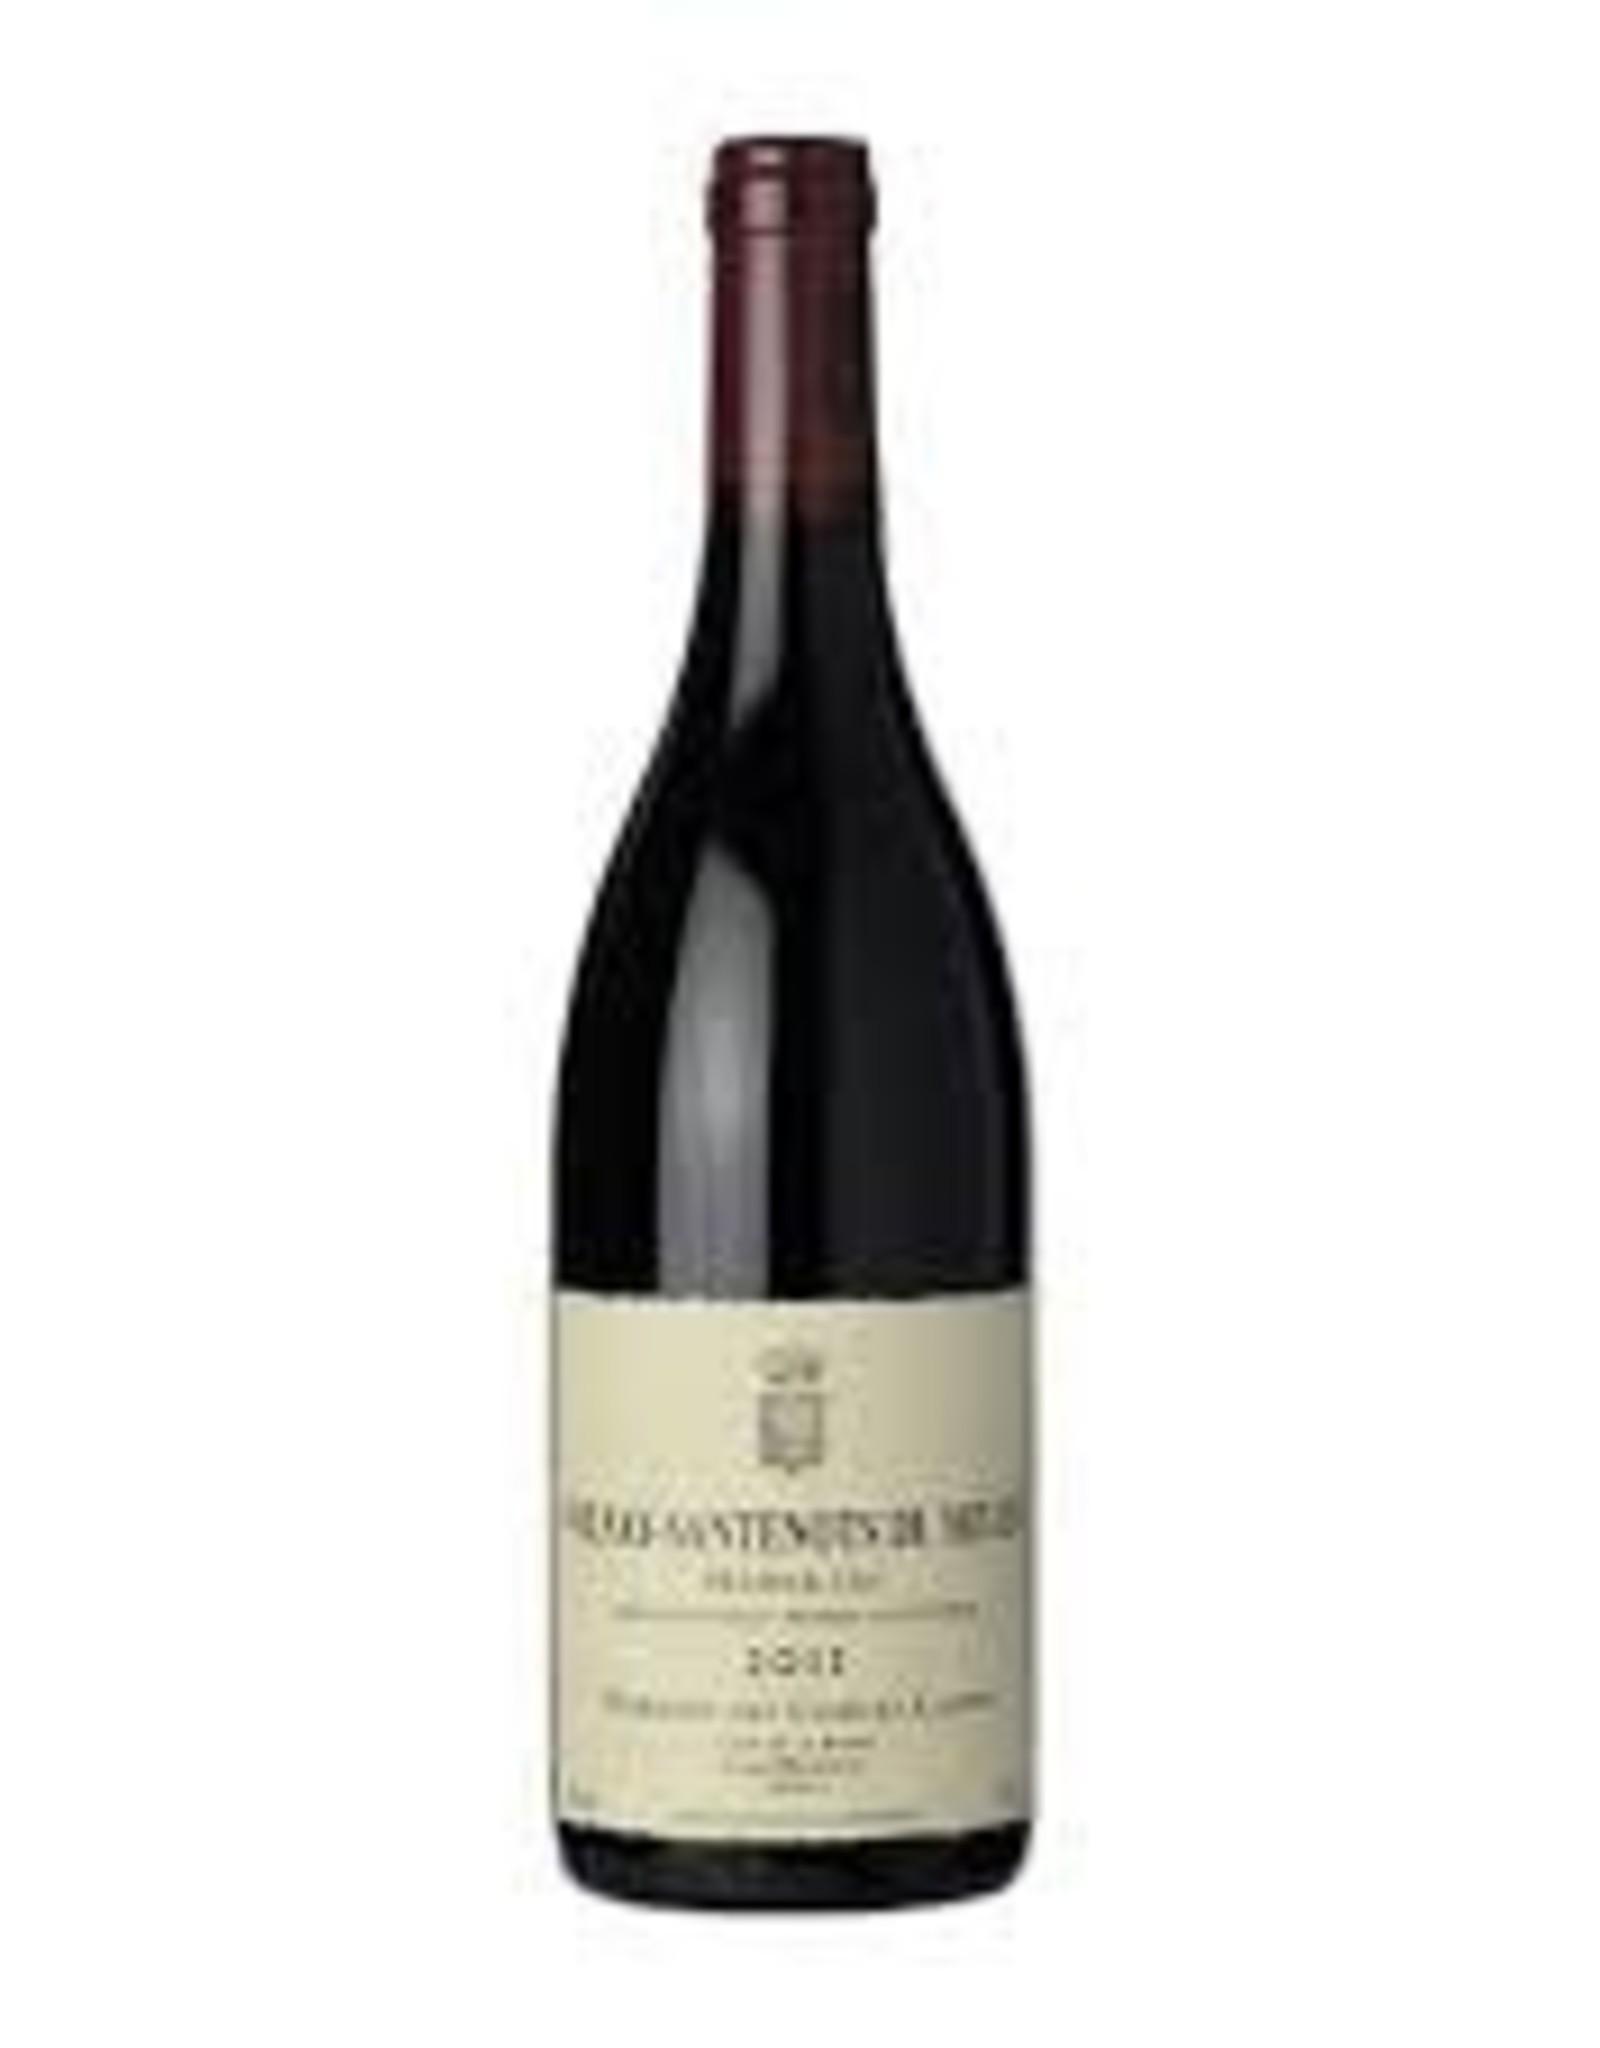 R Burgundy, Volnay, 'SANTENOTS DU MILIEU 1r,' Comtes Lafon 2013